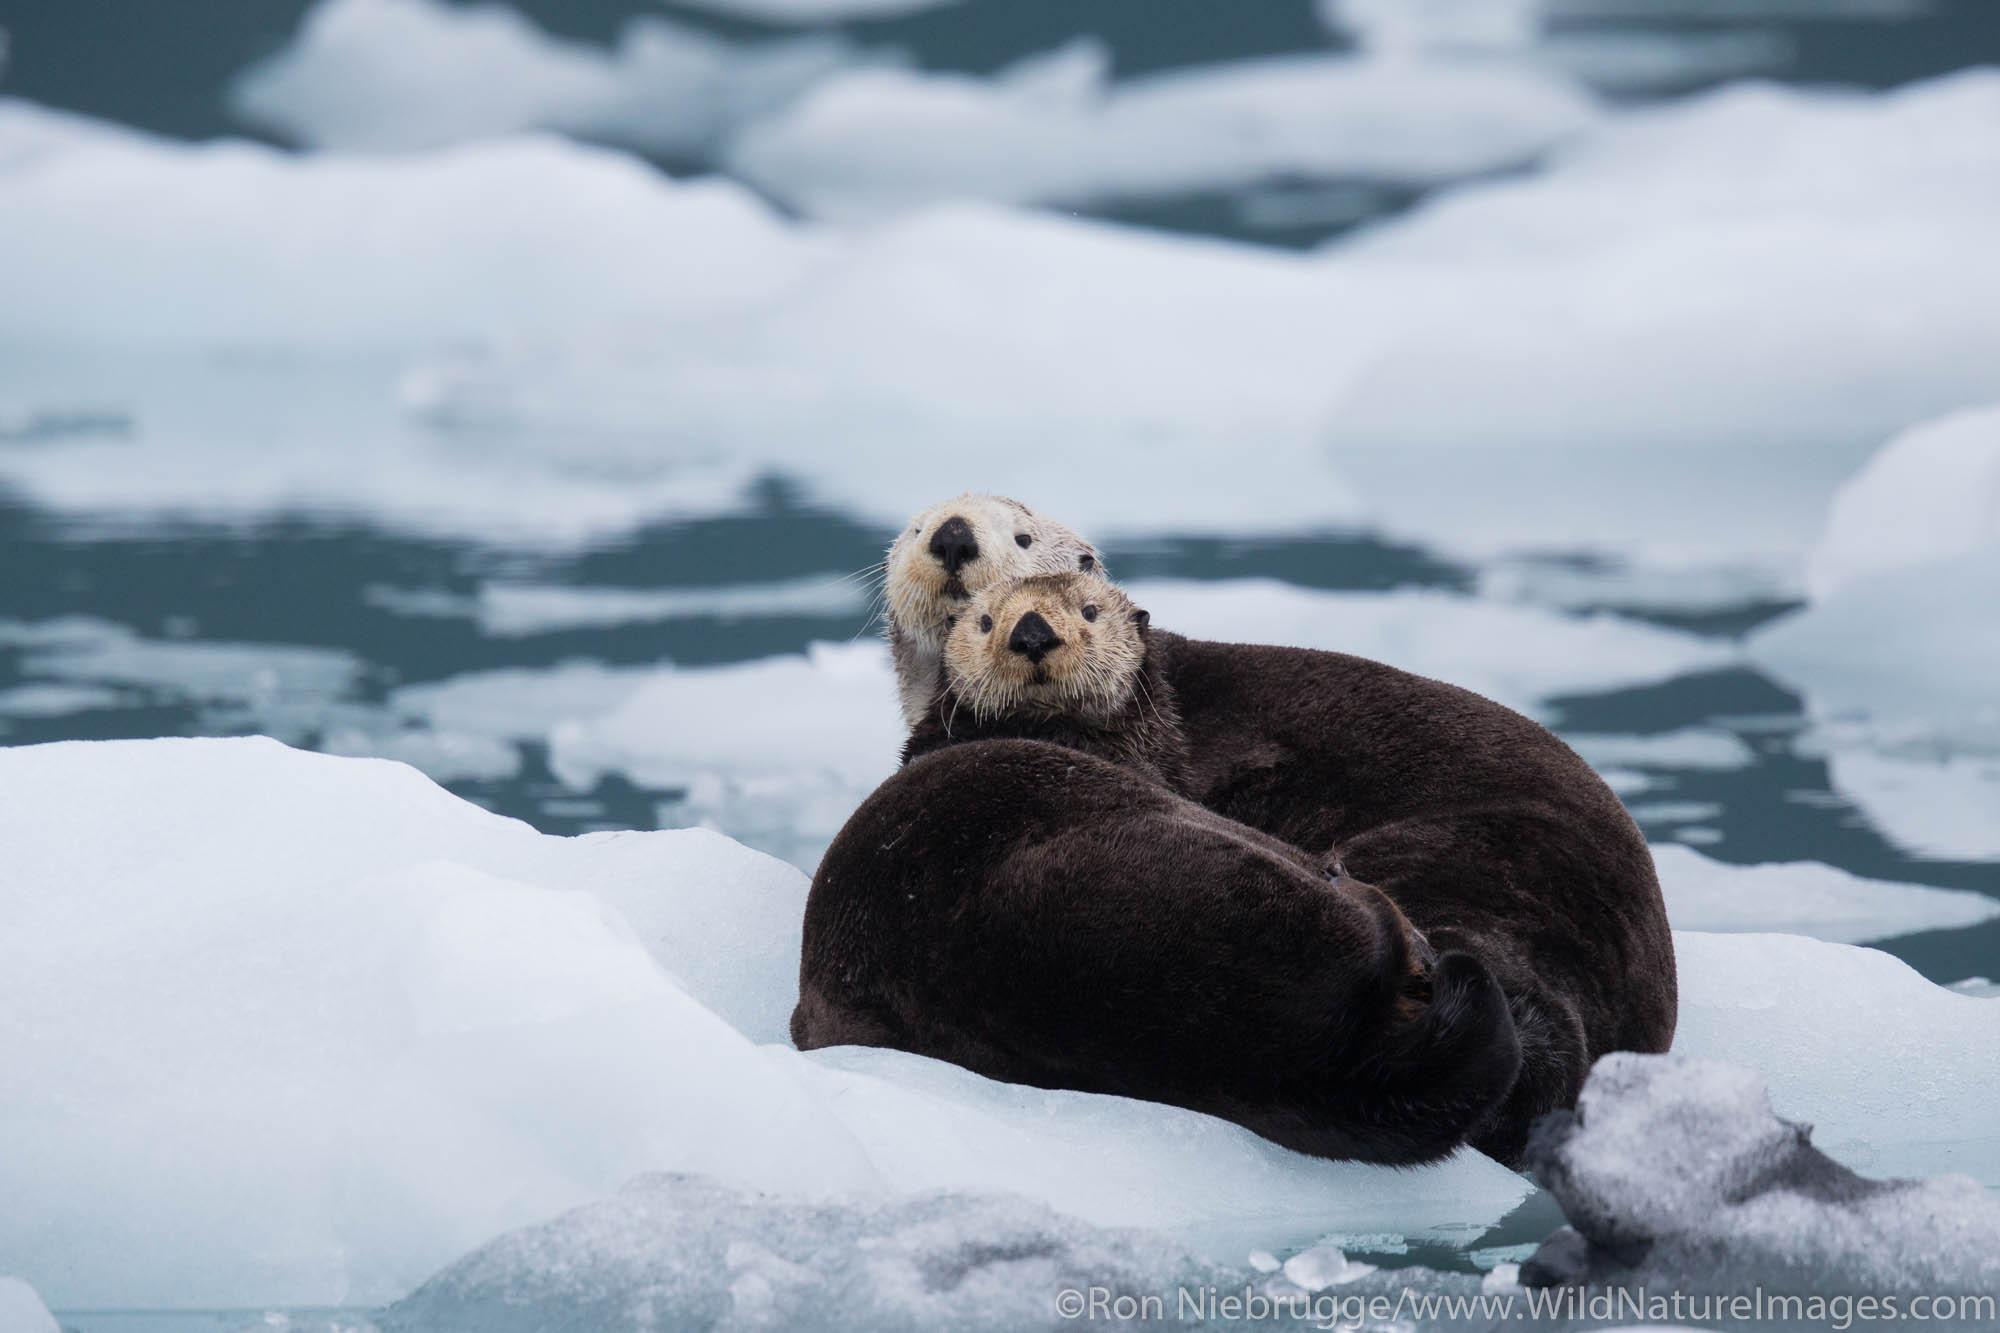 Sea otter, Prince William Sound, Chugach National Forest, Alaska.